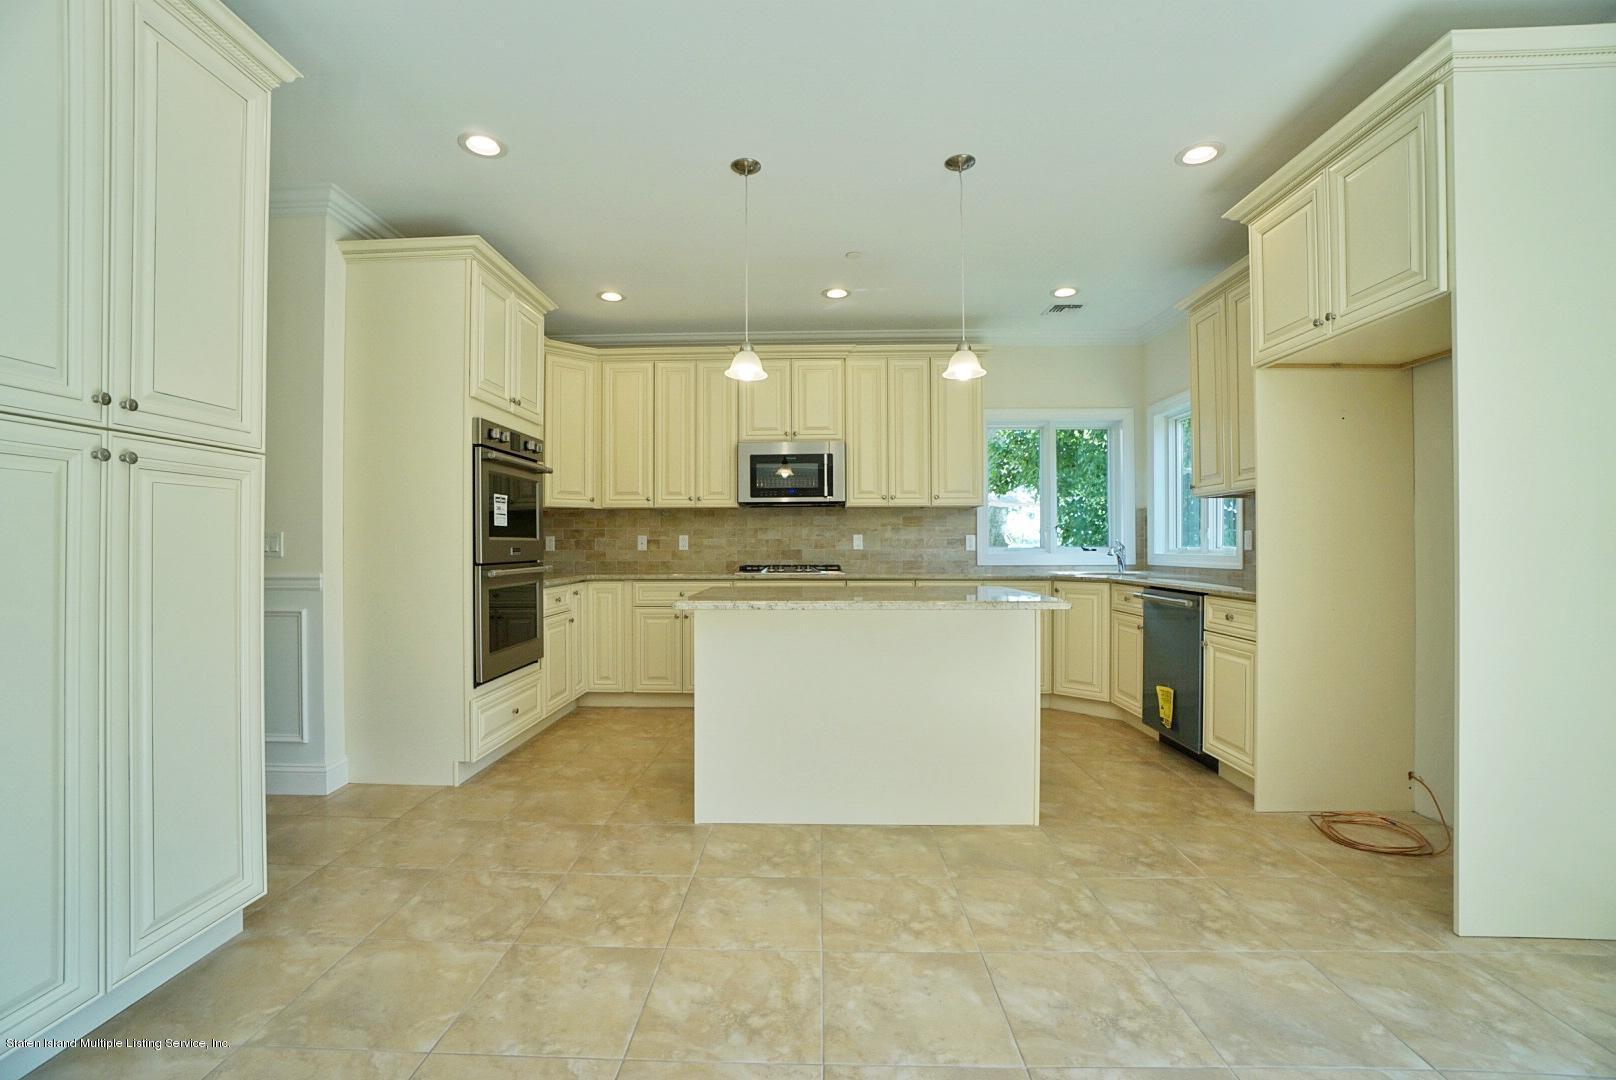 Single Family - Detached 678 Yetman Avenue  Staten Island, NY 10307, MLS-1132766-21